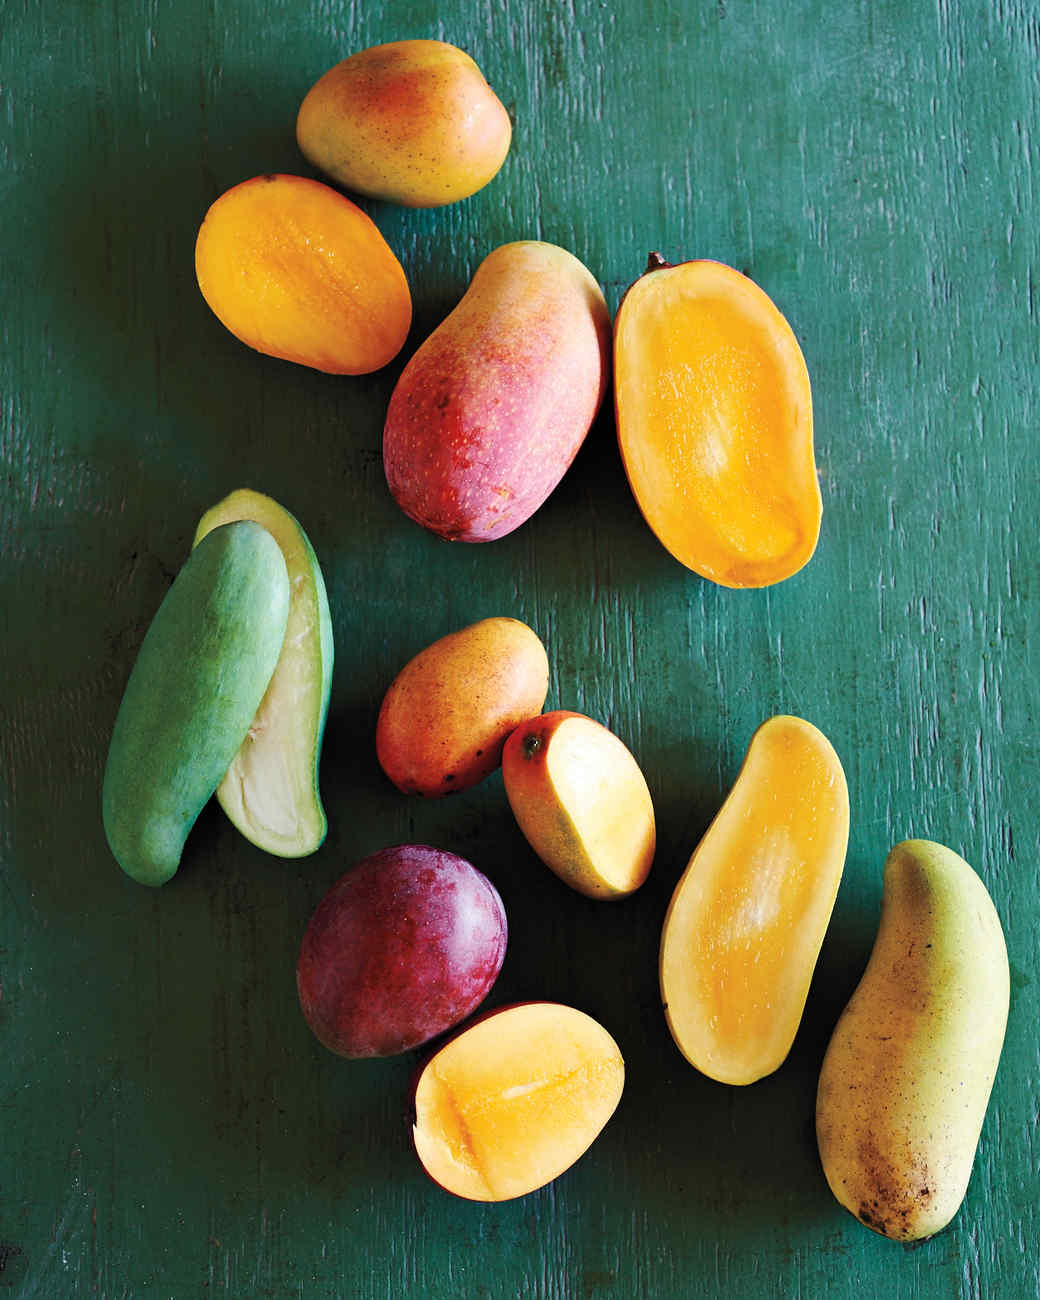 tropical-fruit-pine-island-florida-glossary-mango-096-d112247.jpg